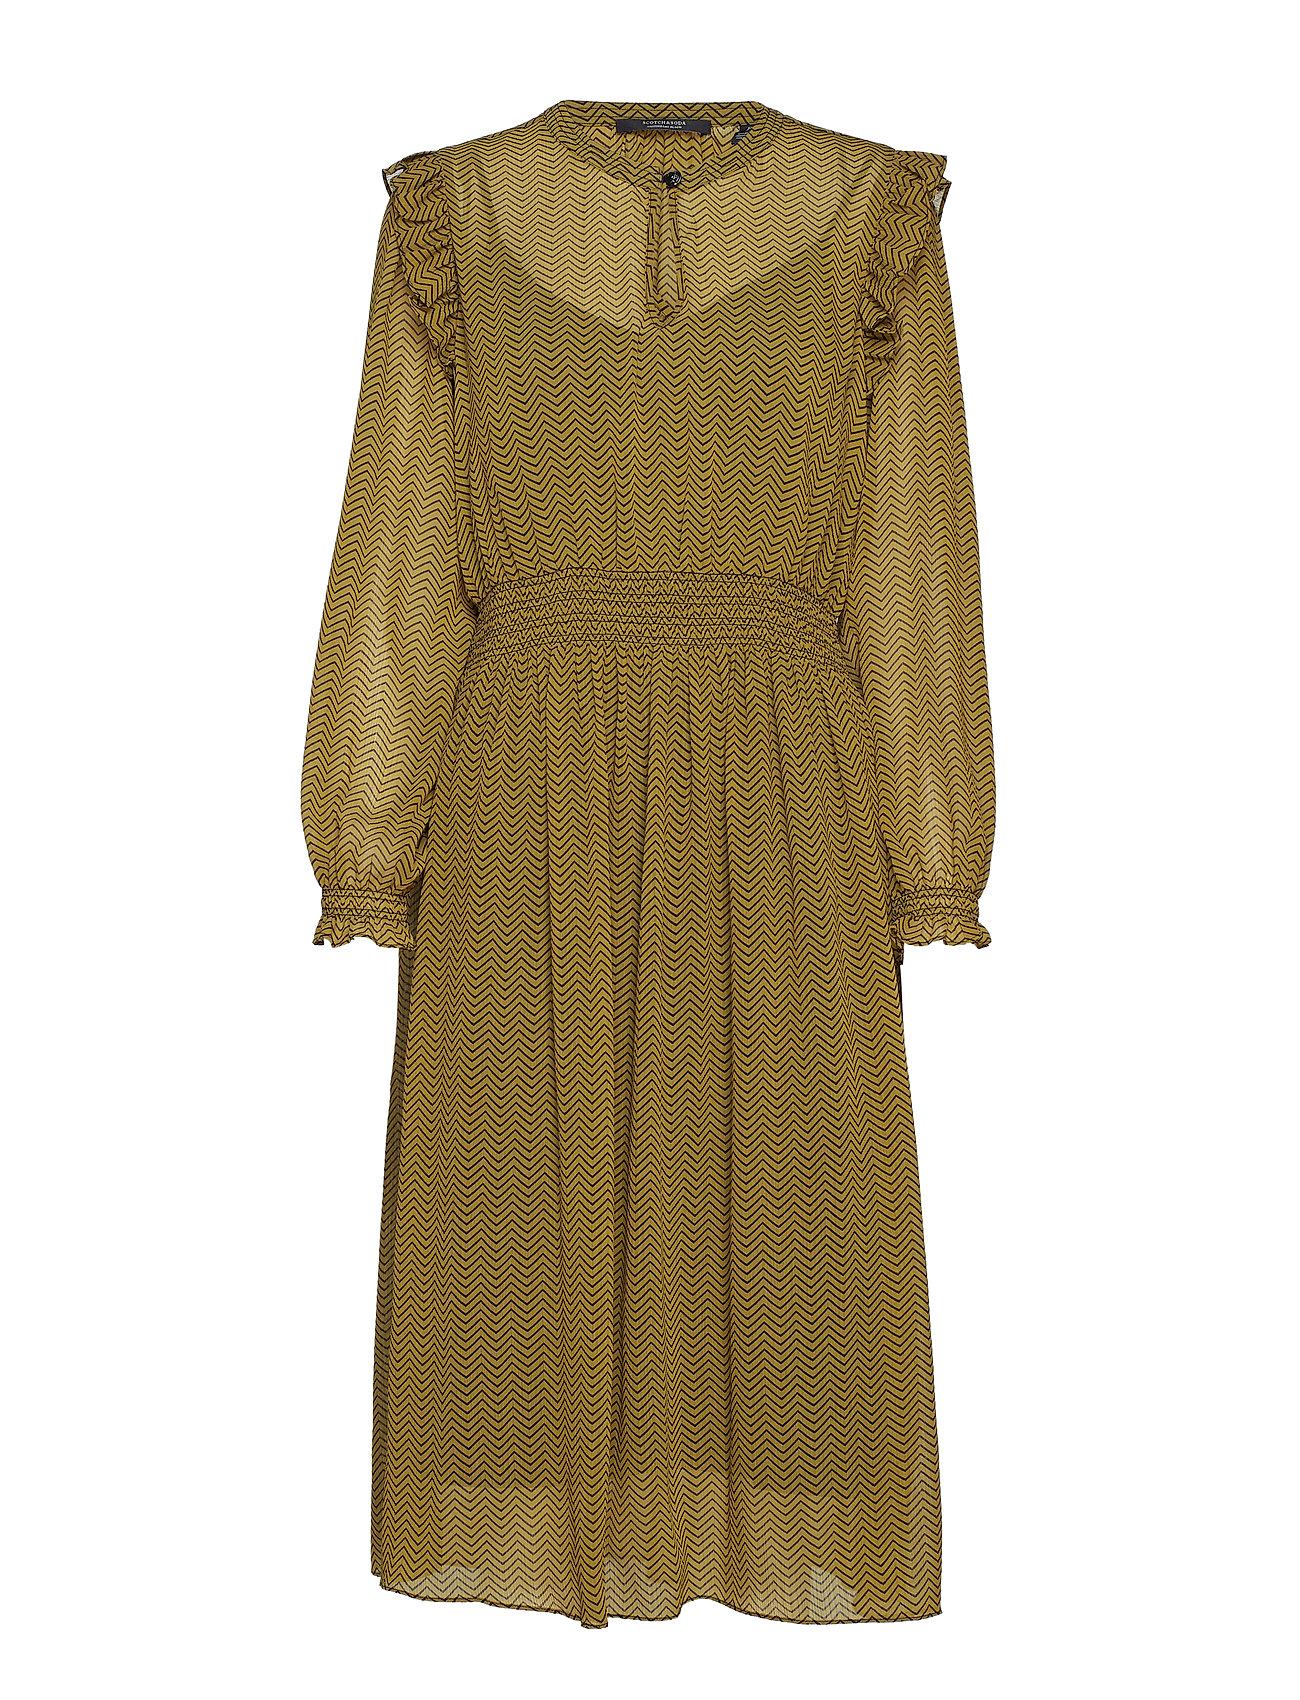 Scotch & Soda Allover printed dress - COMBO A